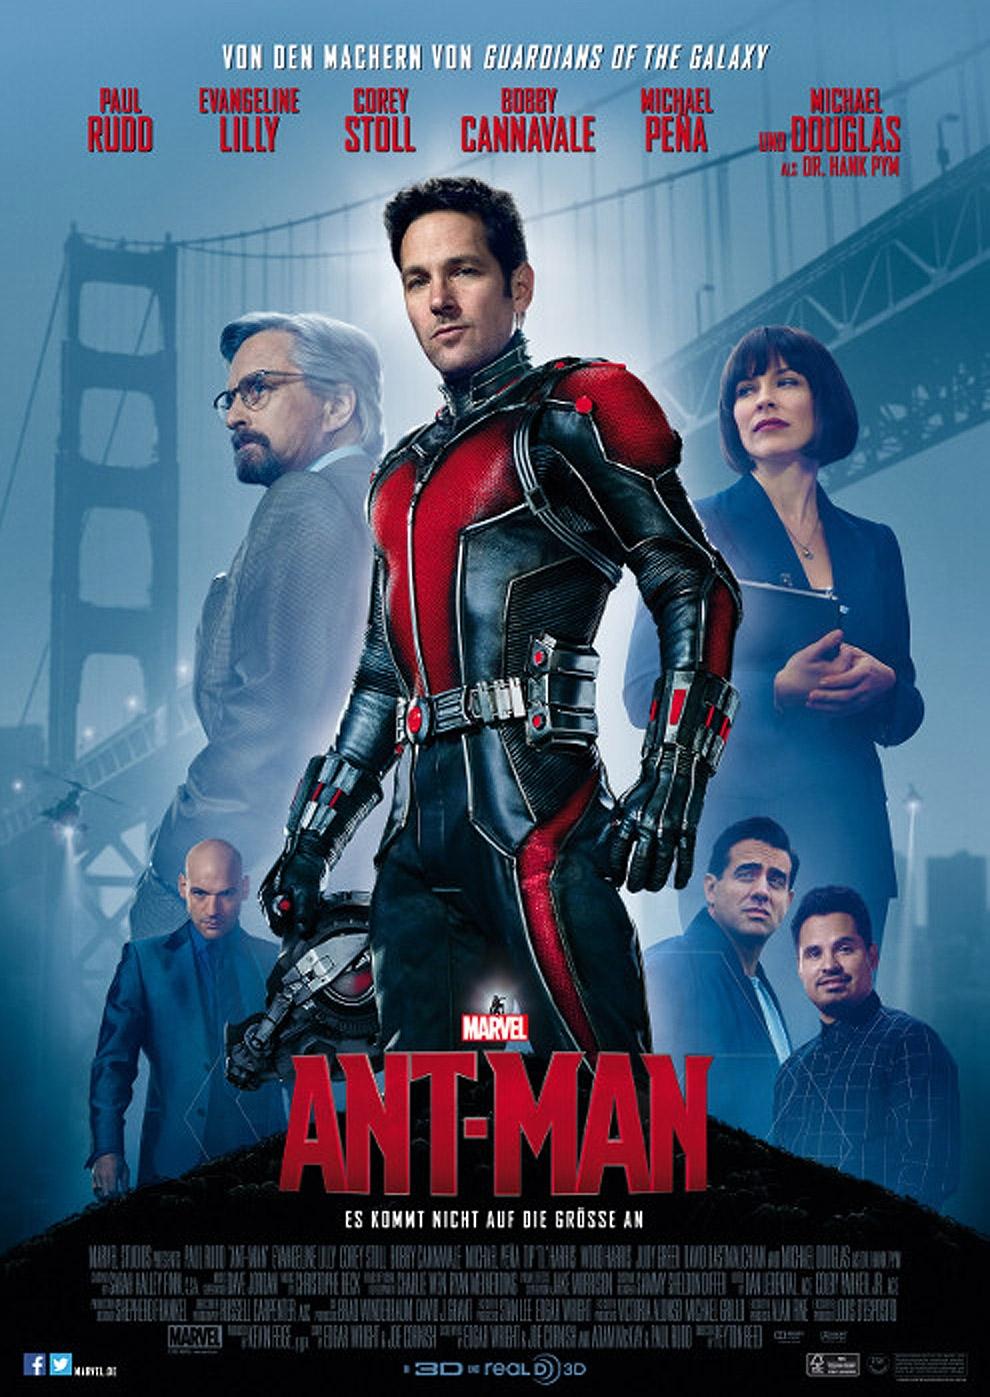 Ant-Man (Poster)